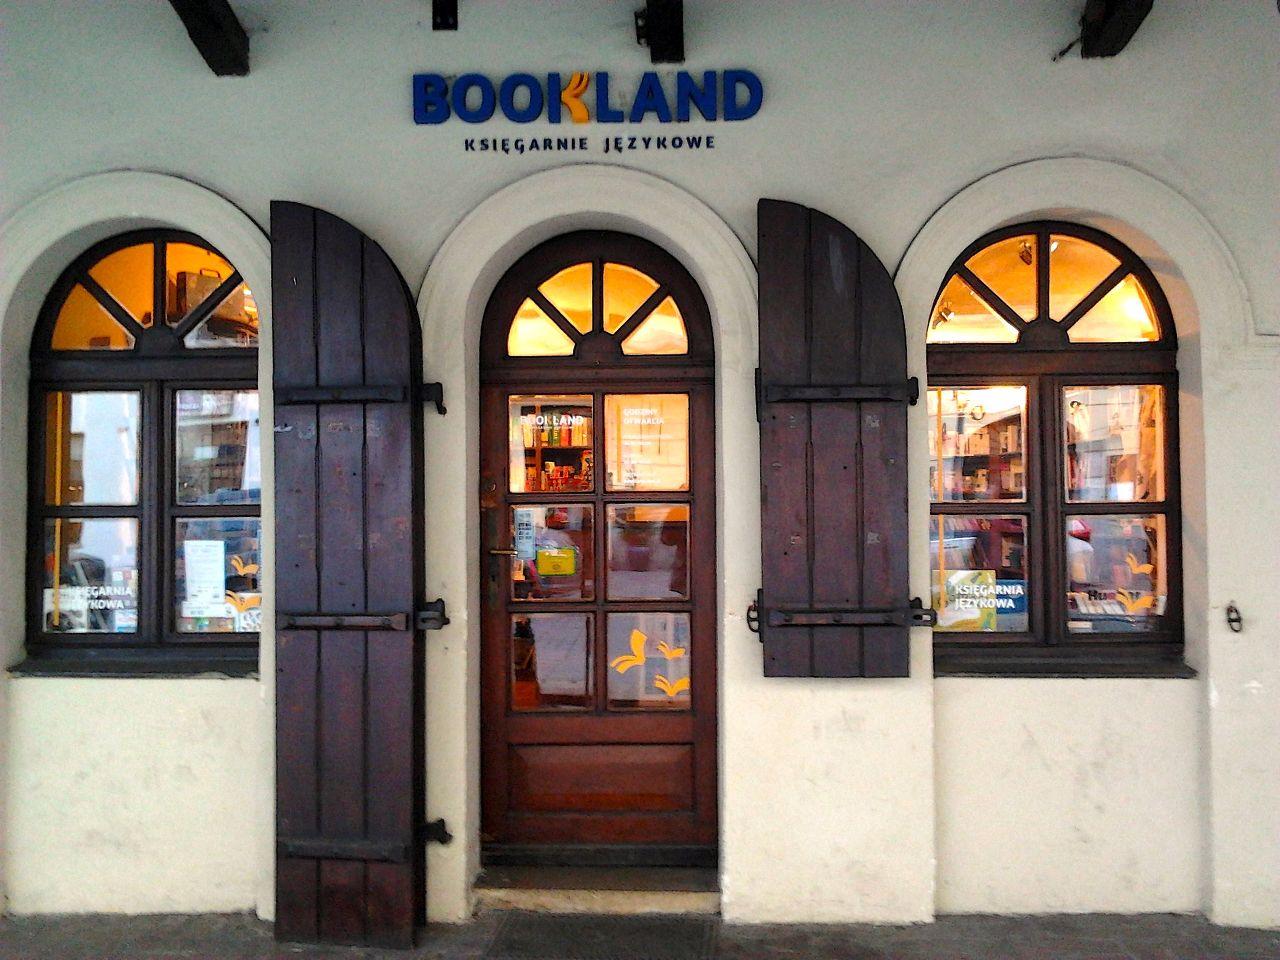 Photo 1 of Bookland